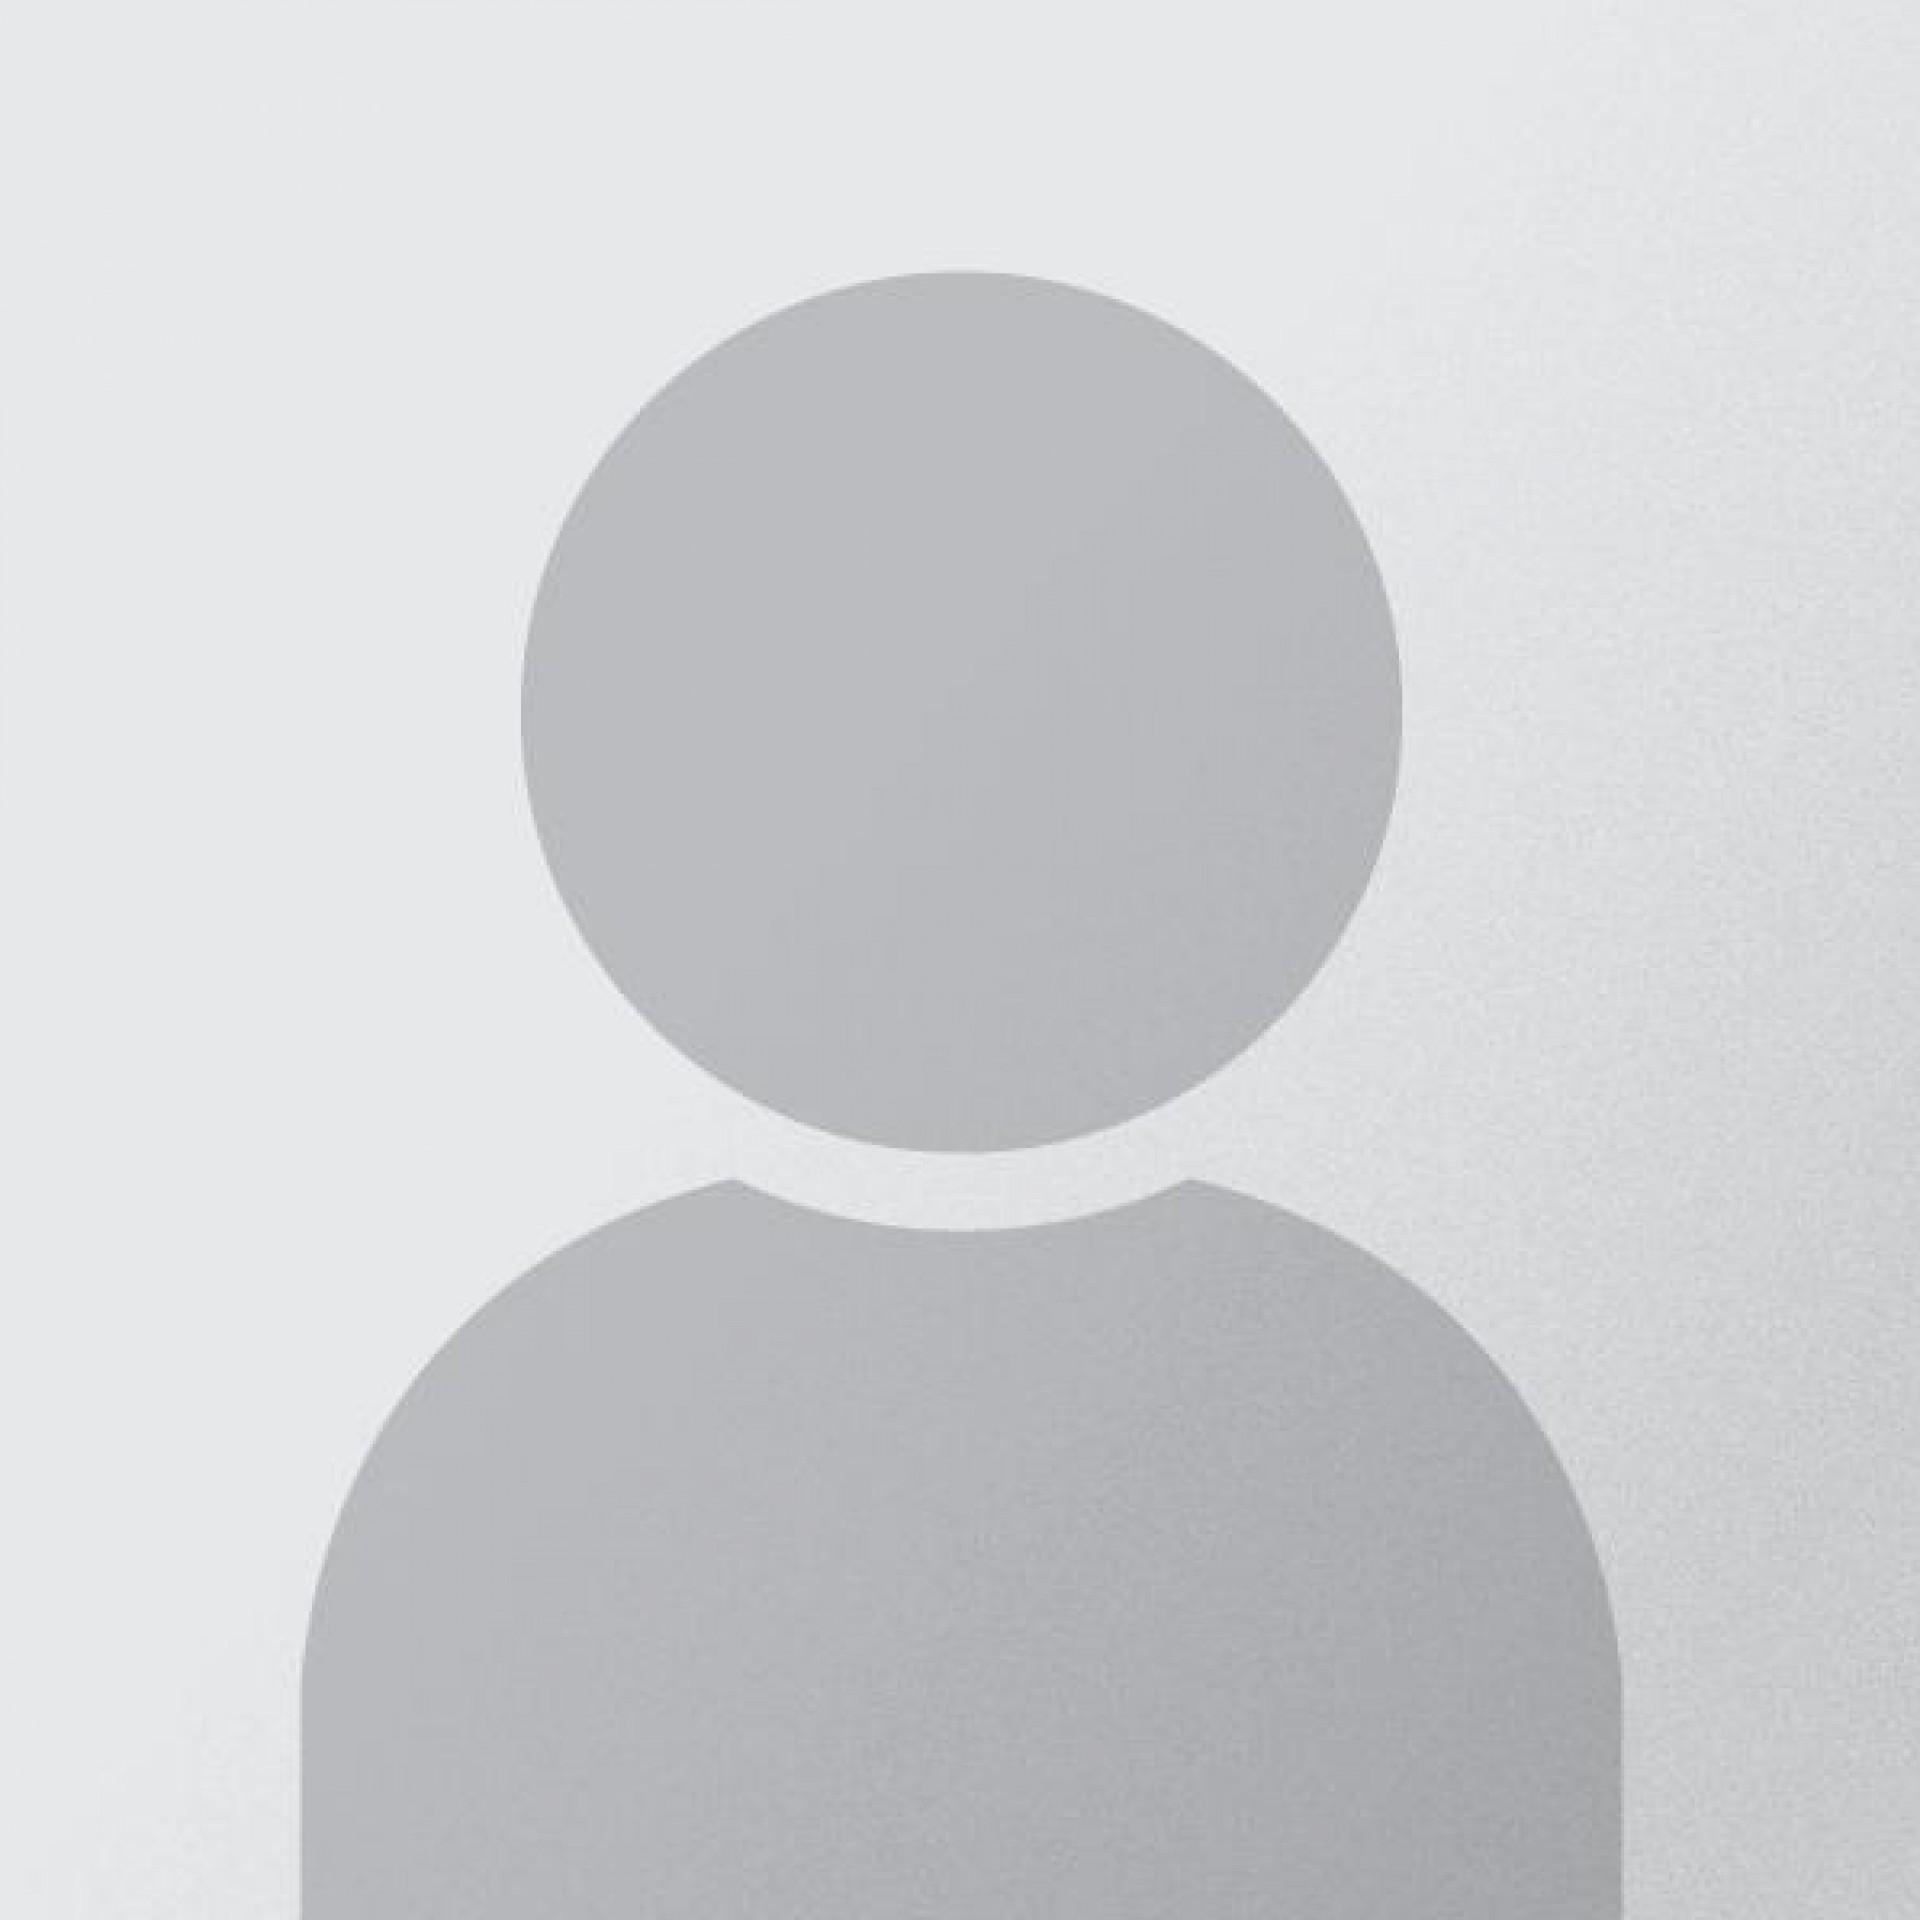 fotografia p021 profilu 01025IQOML